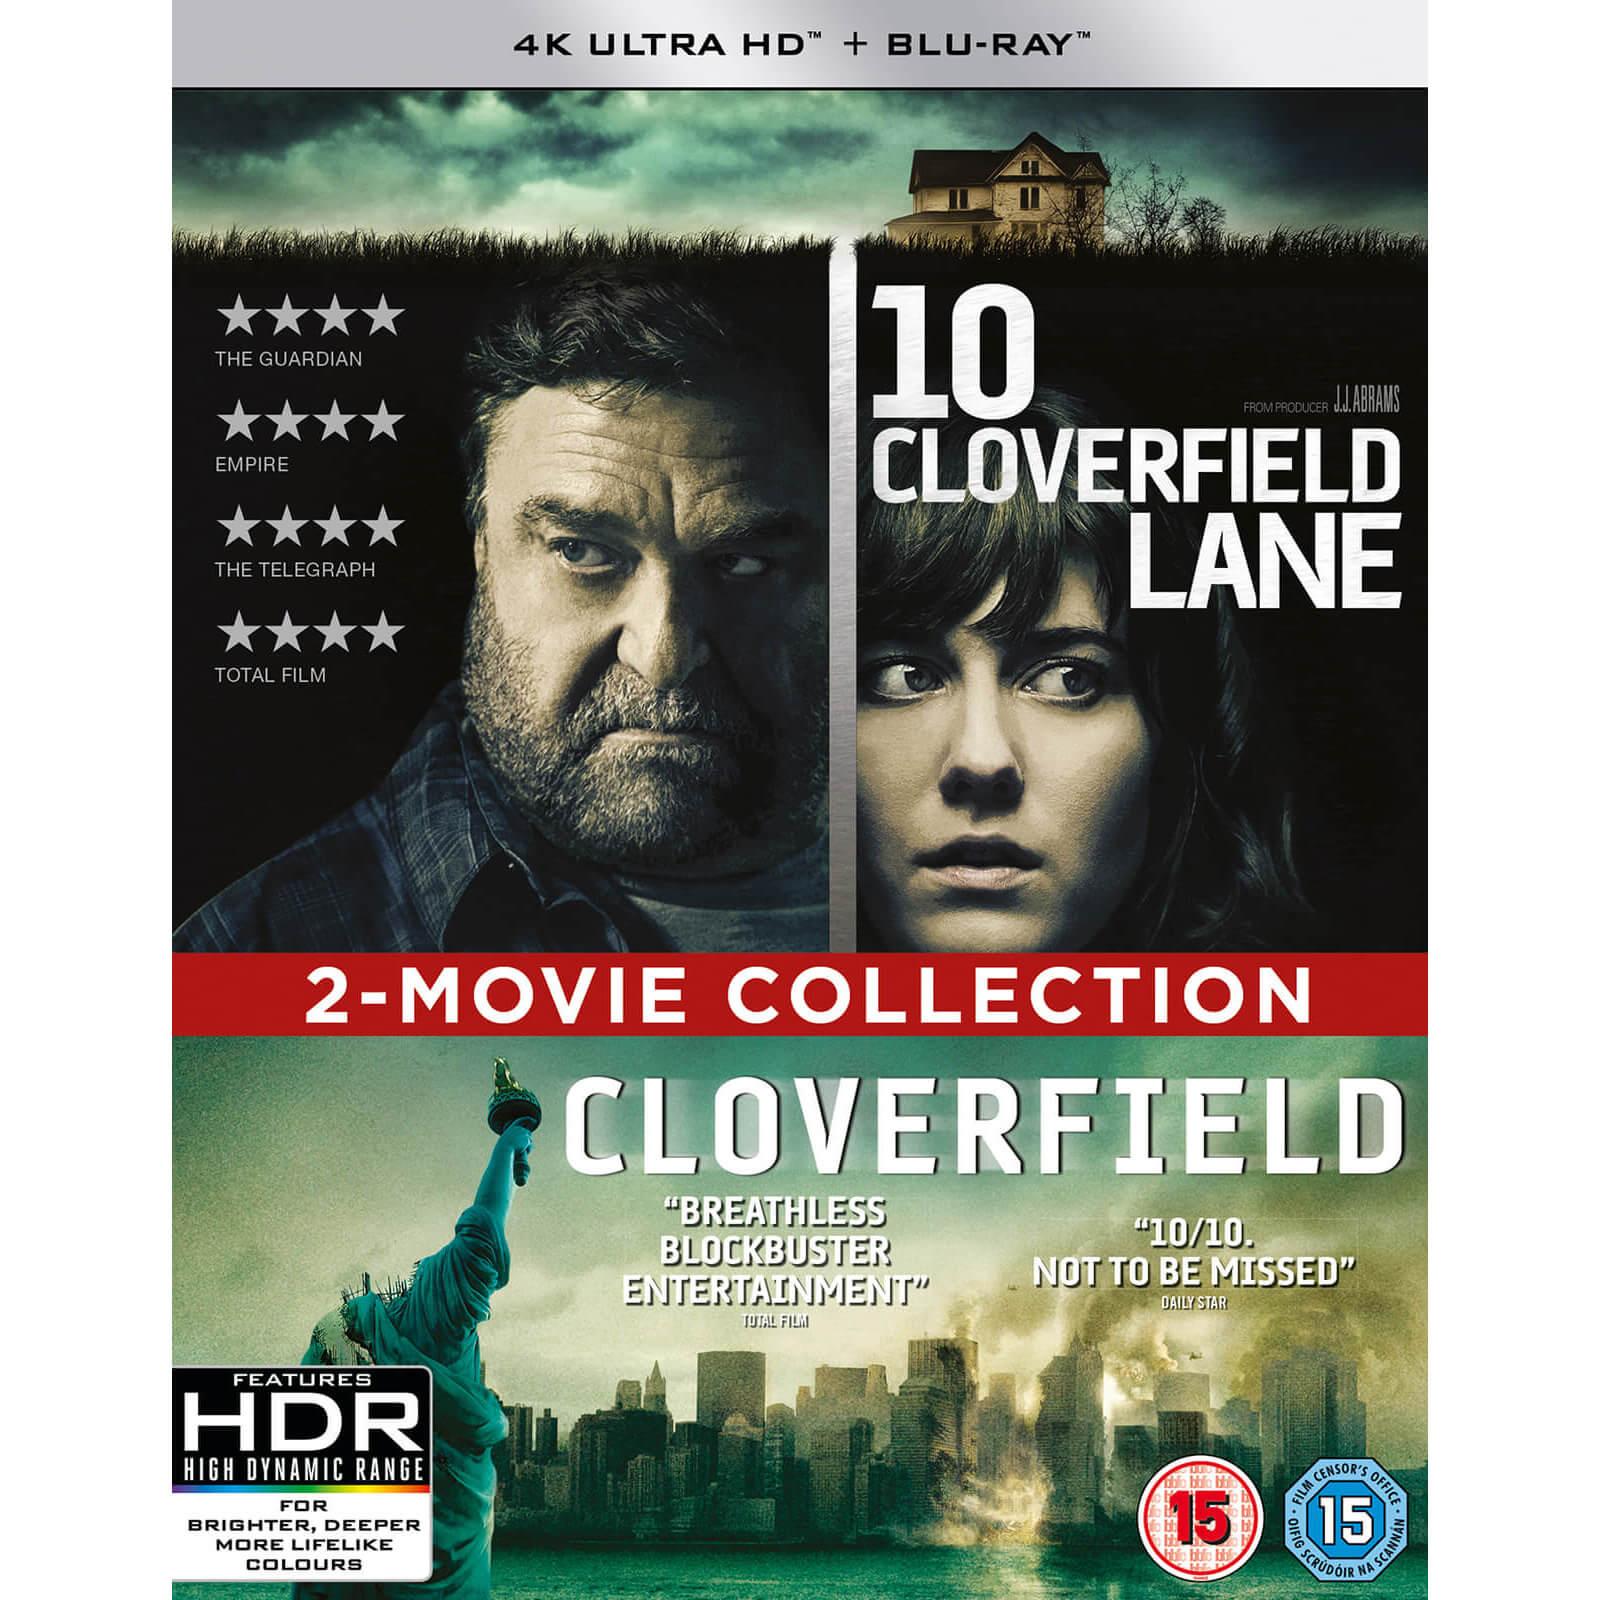 Universal Pictures 10 Cloverfield Lane/Cloverfield - 4K Ultra HD